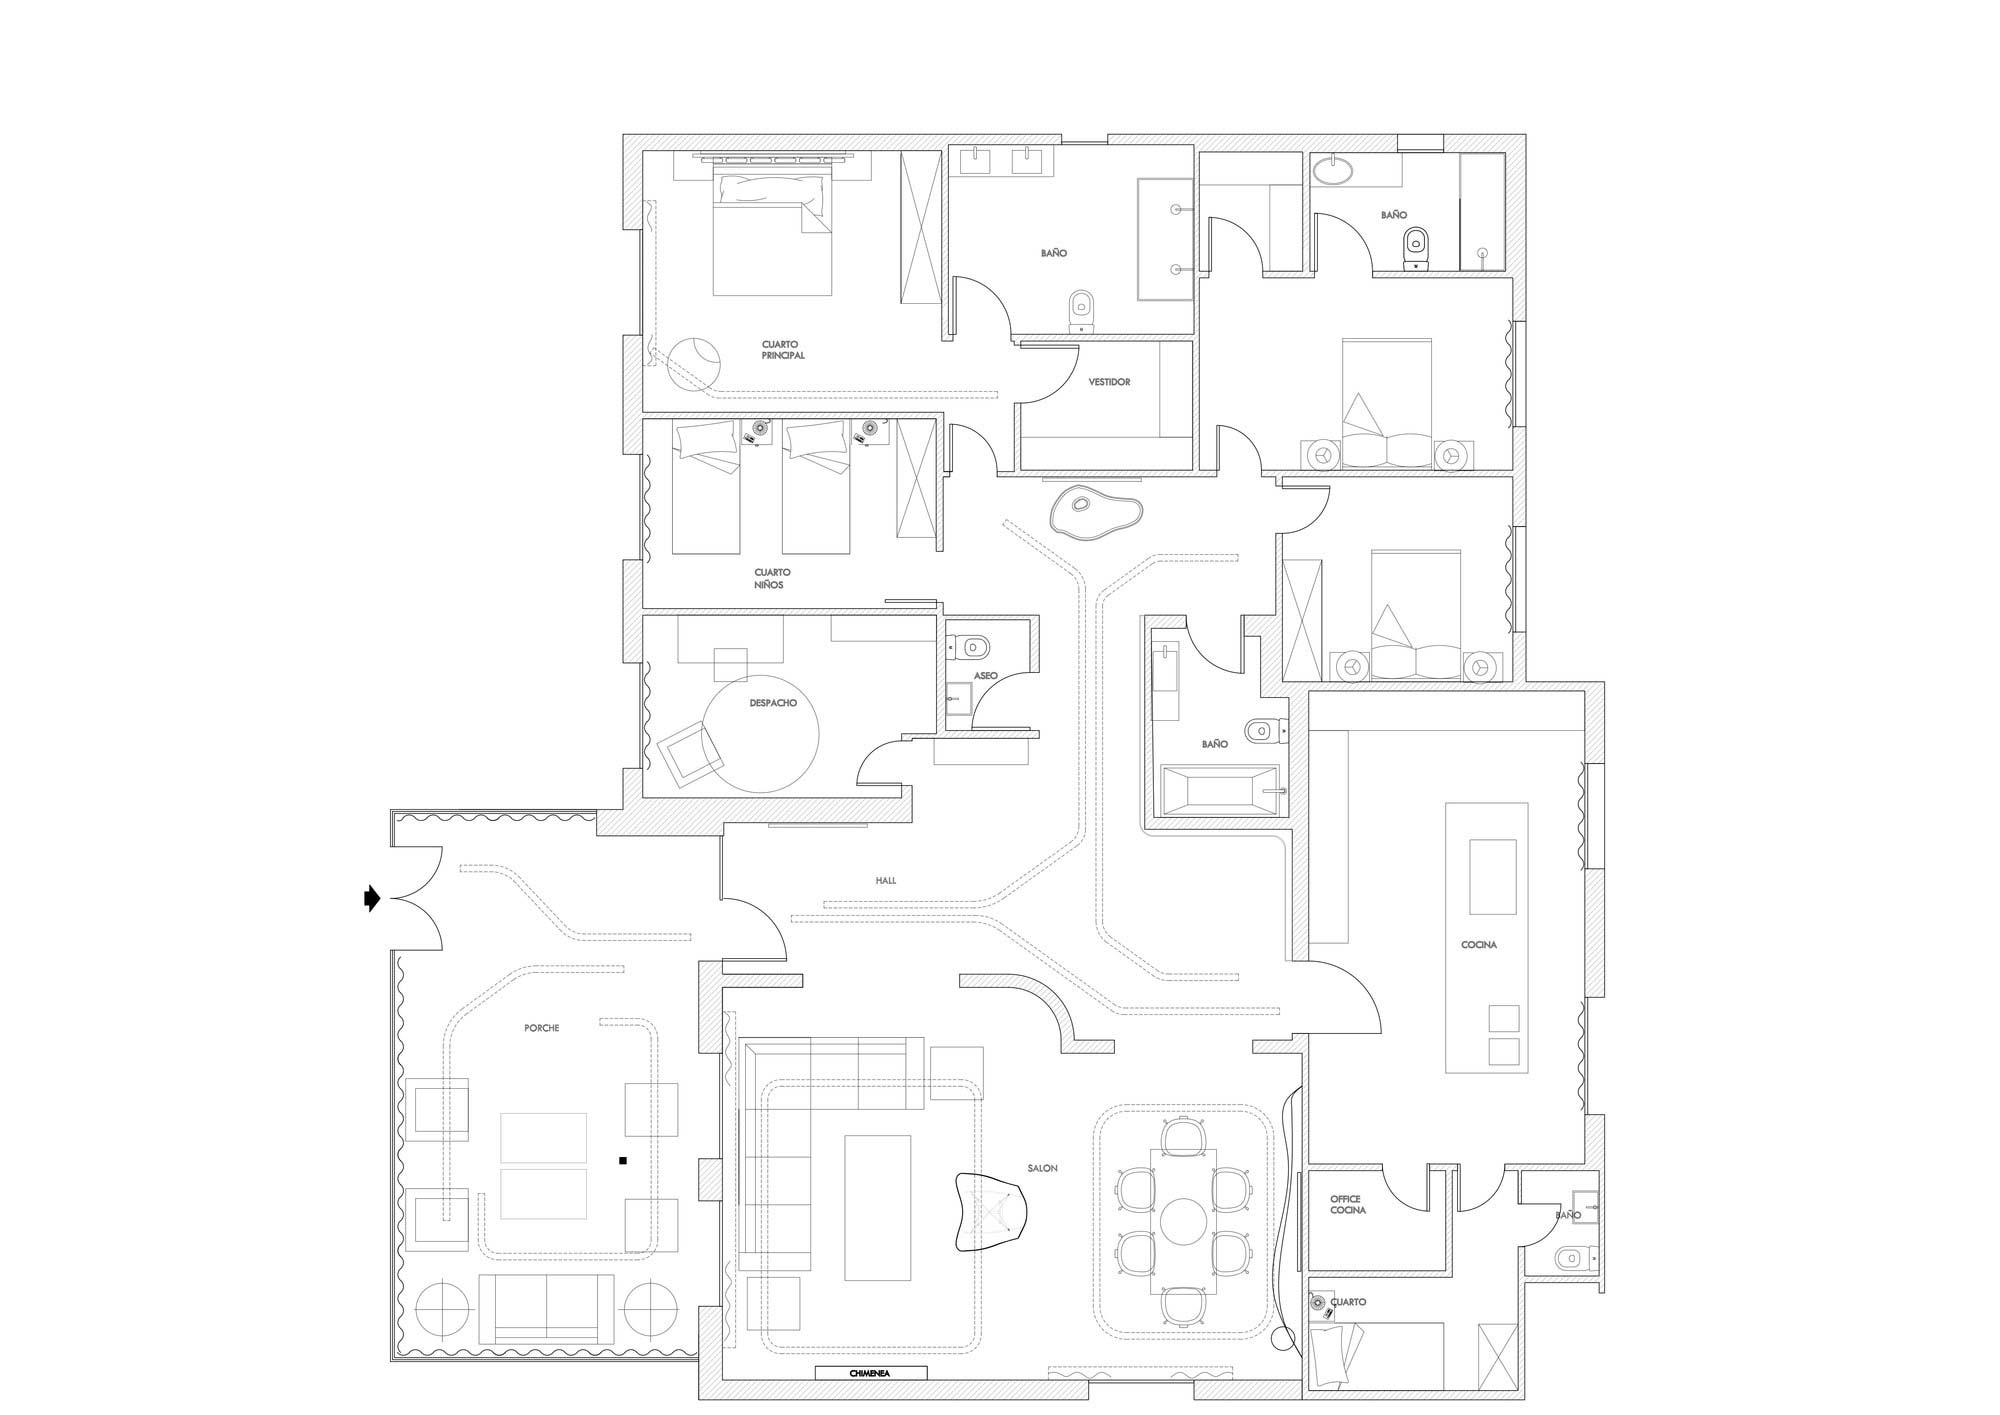 Floor Plan, Modern Apartment in Madrid Designed by IlmioDesign